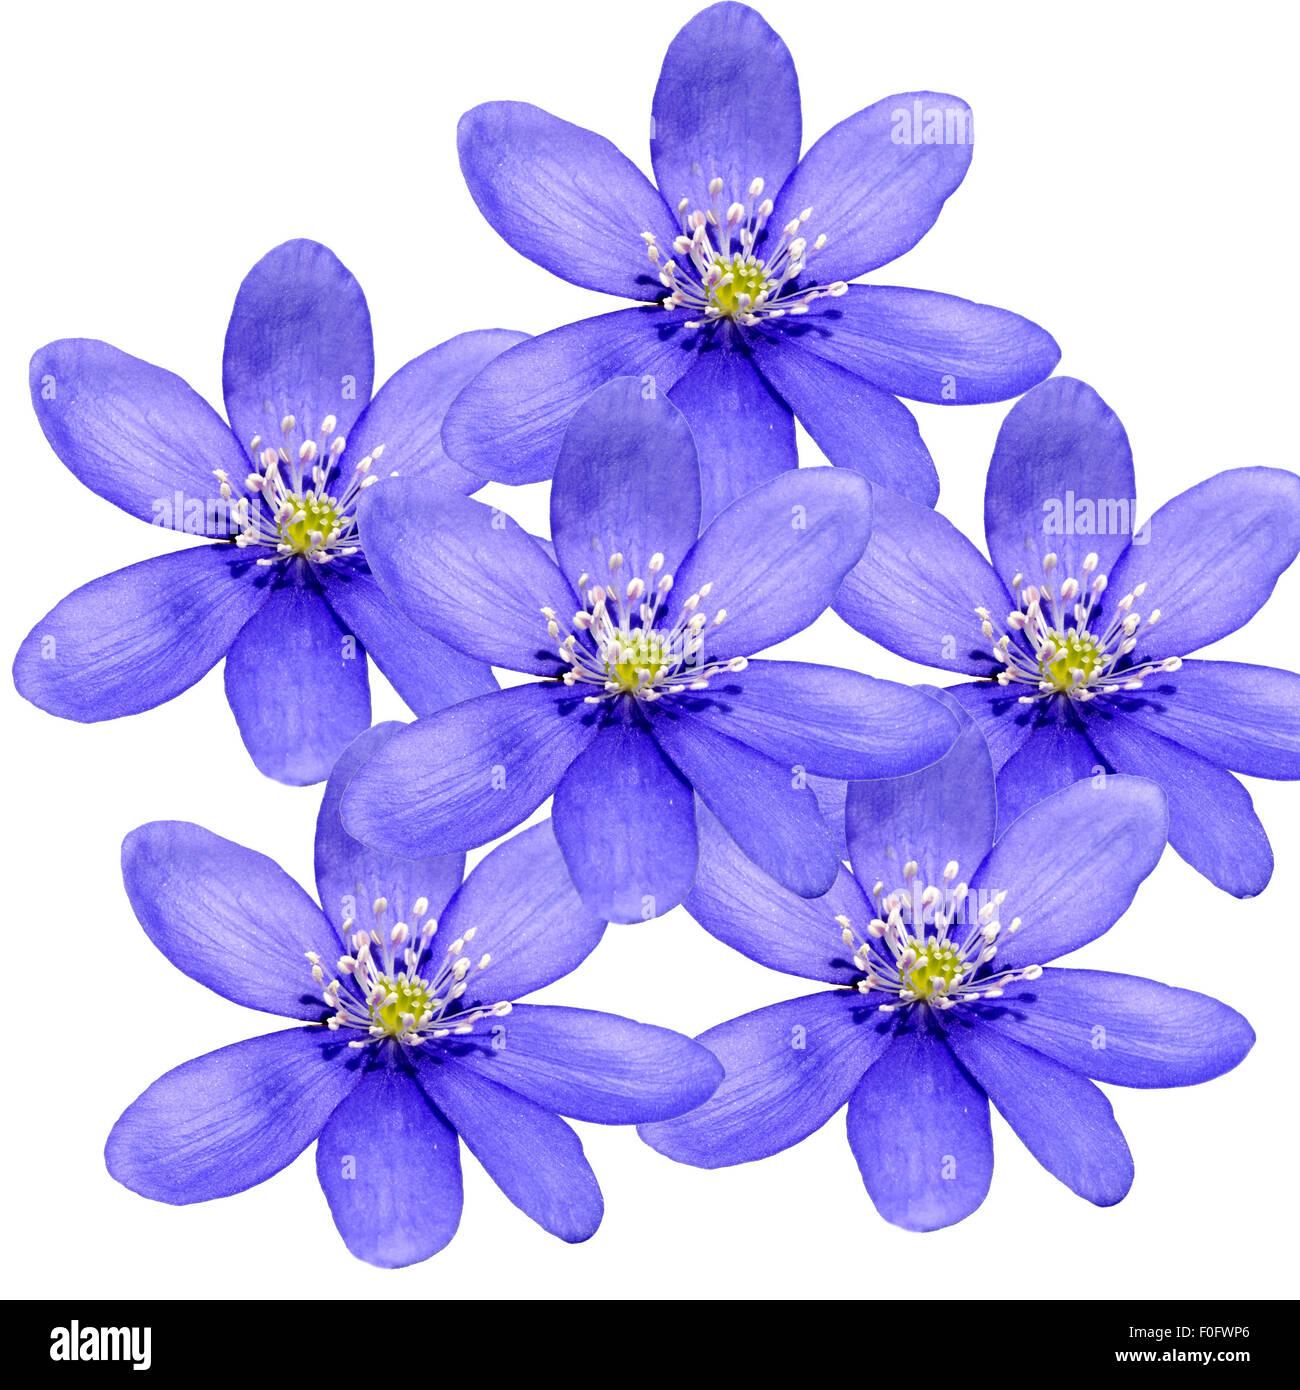 Leberbluemchen, Hepatica, nobilis, Winterblueher, Anemone hepatica, blaue blueten, blau, Blume des Jahres 2013, - Stock Photo